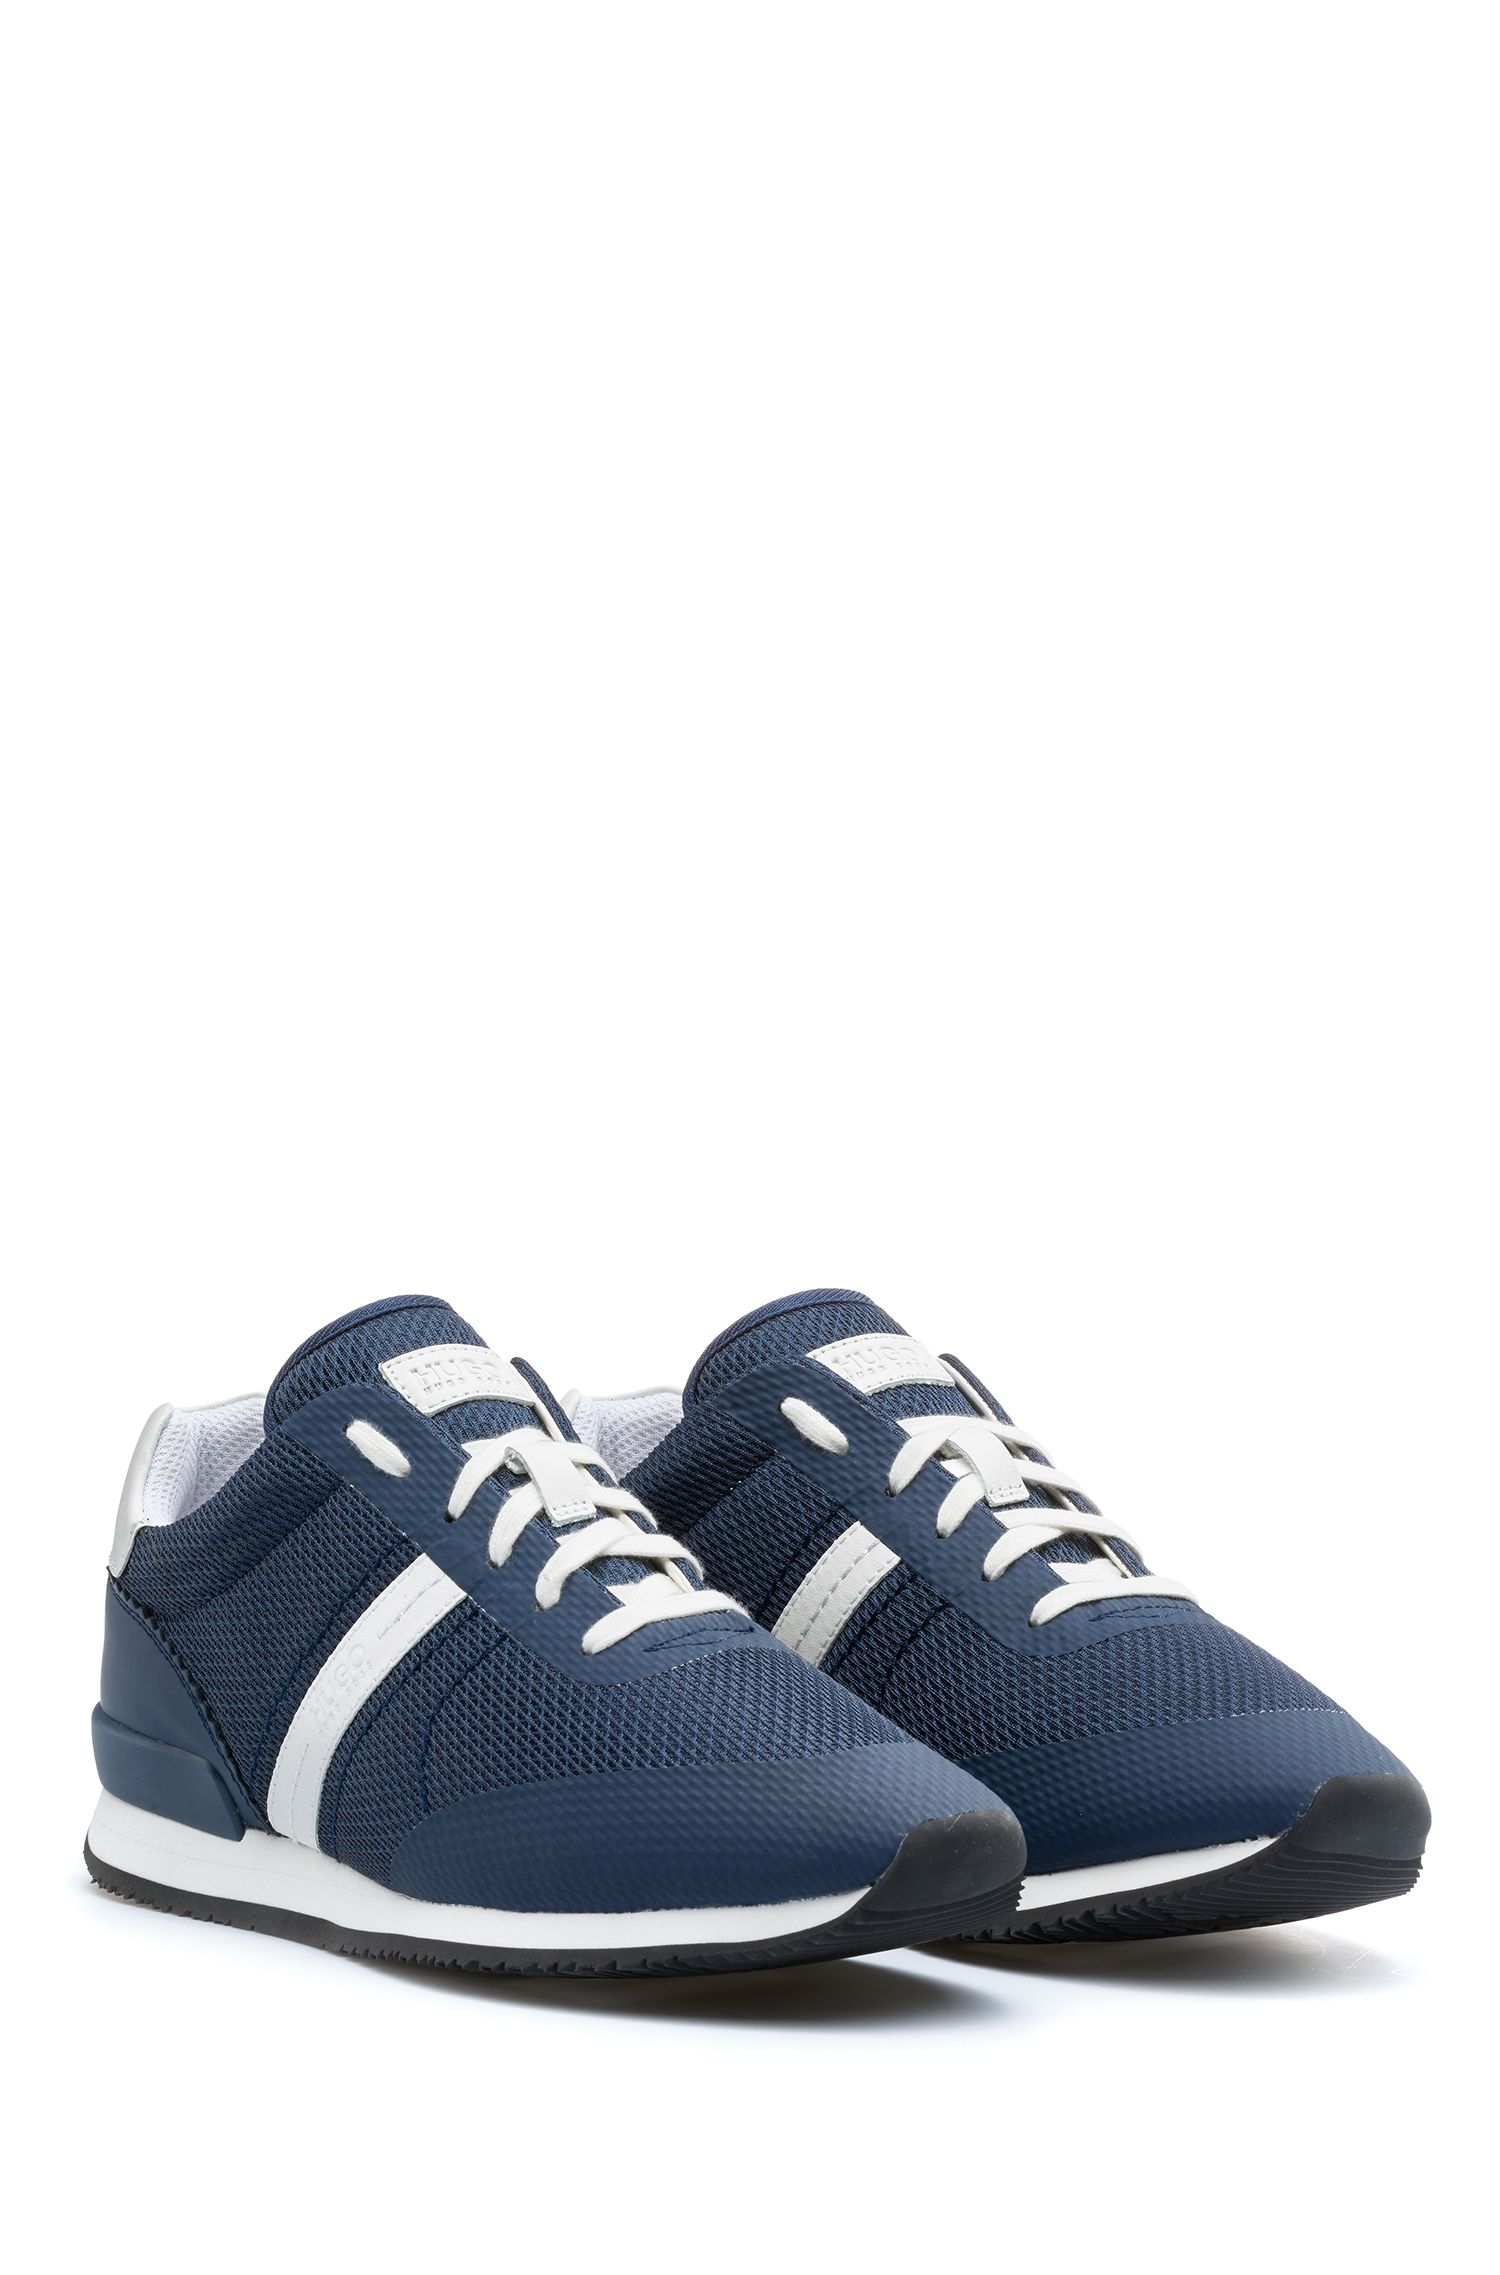 Sneakers low-top stringate con tomaia ibrida, Celeste